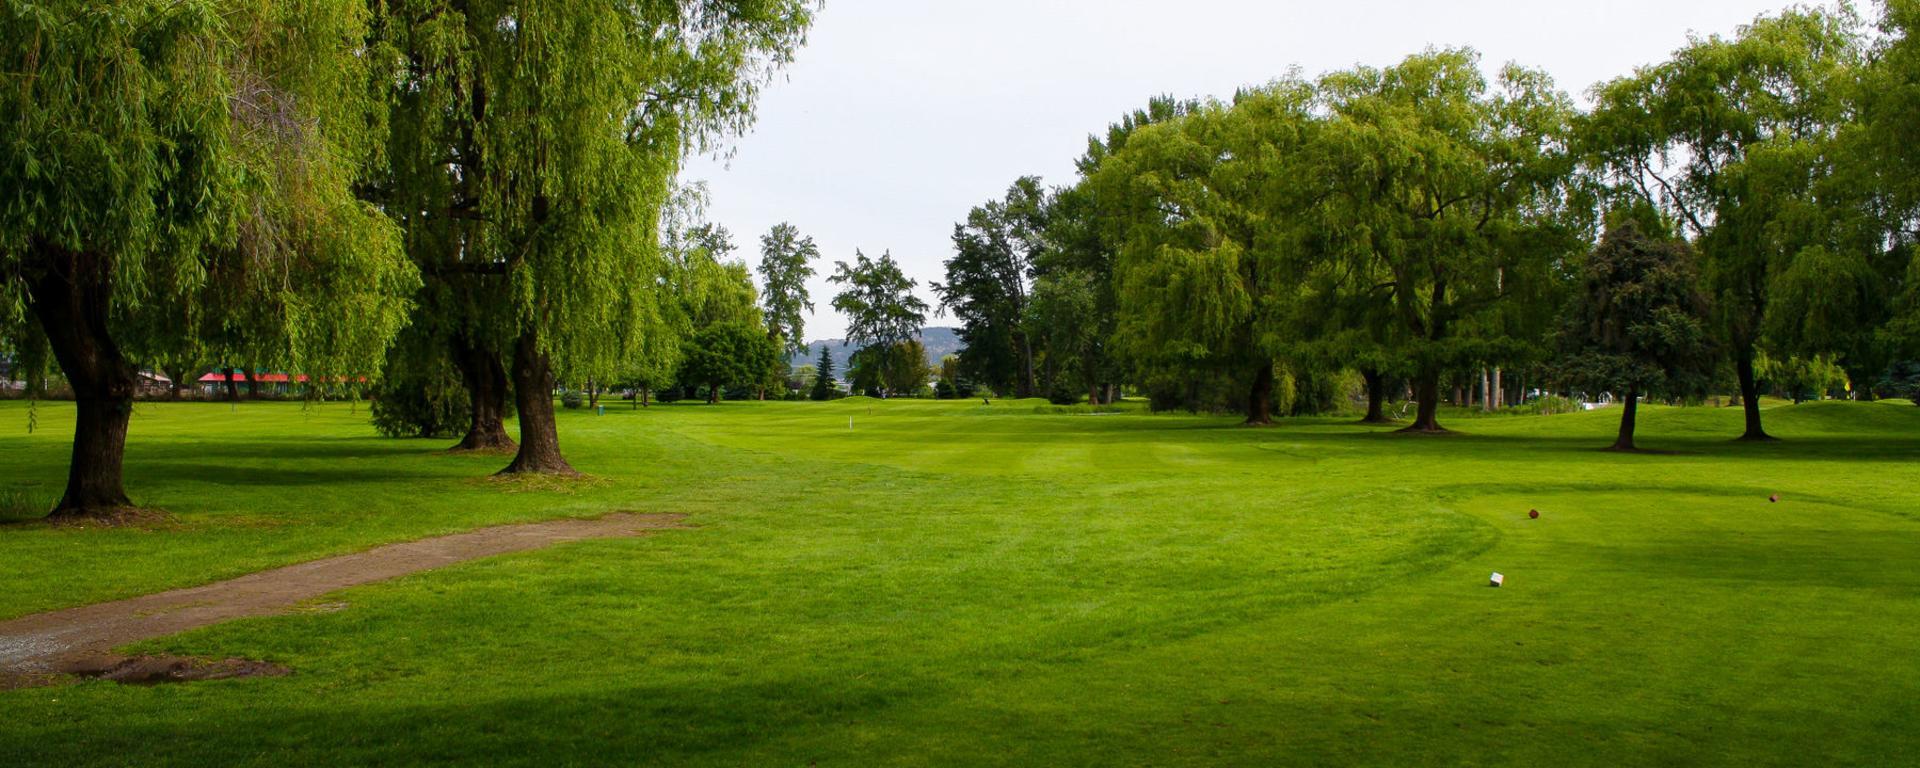 Mission Creek Golf Course Image 1